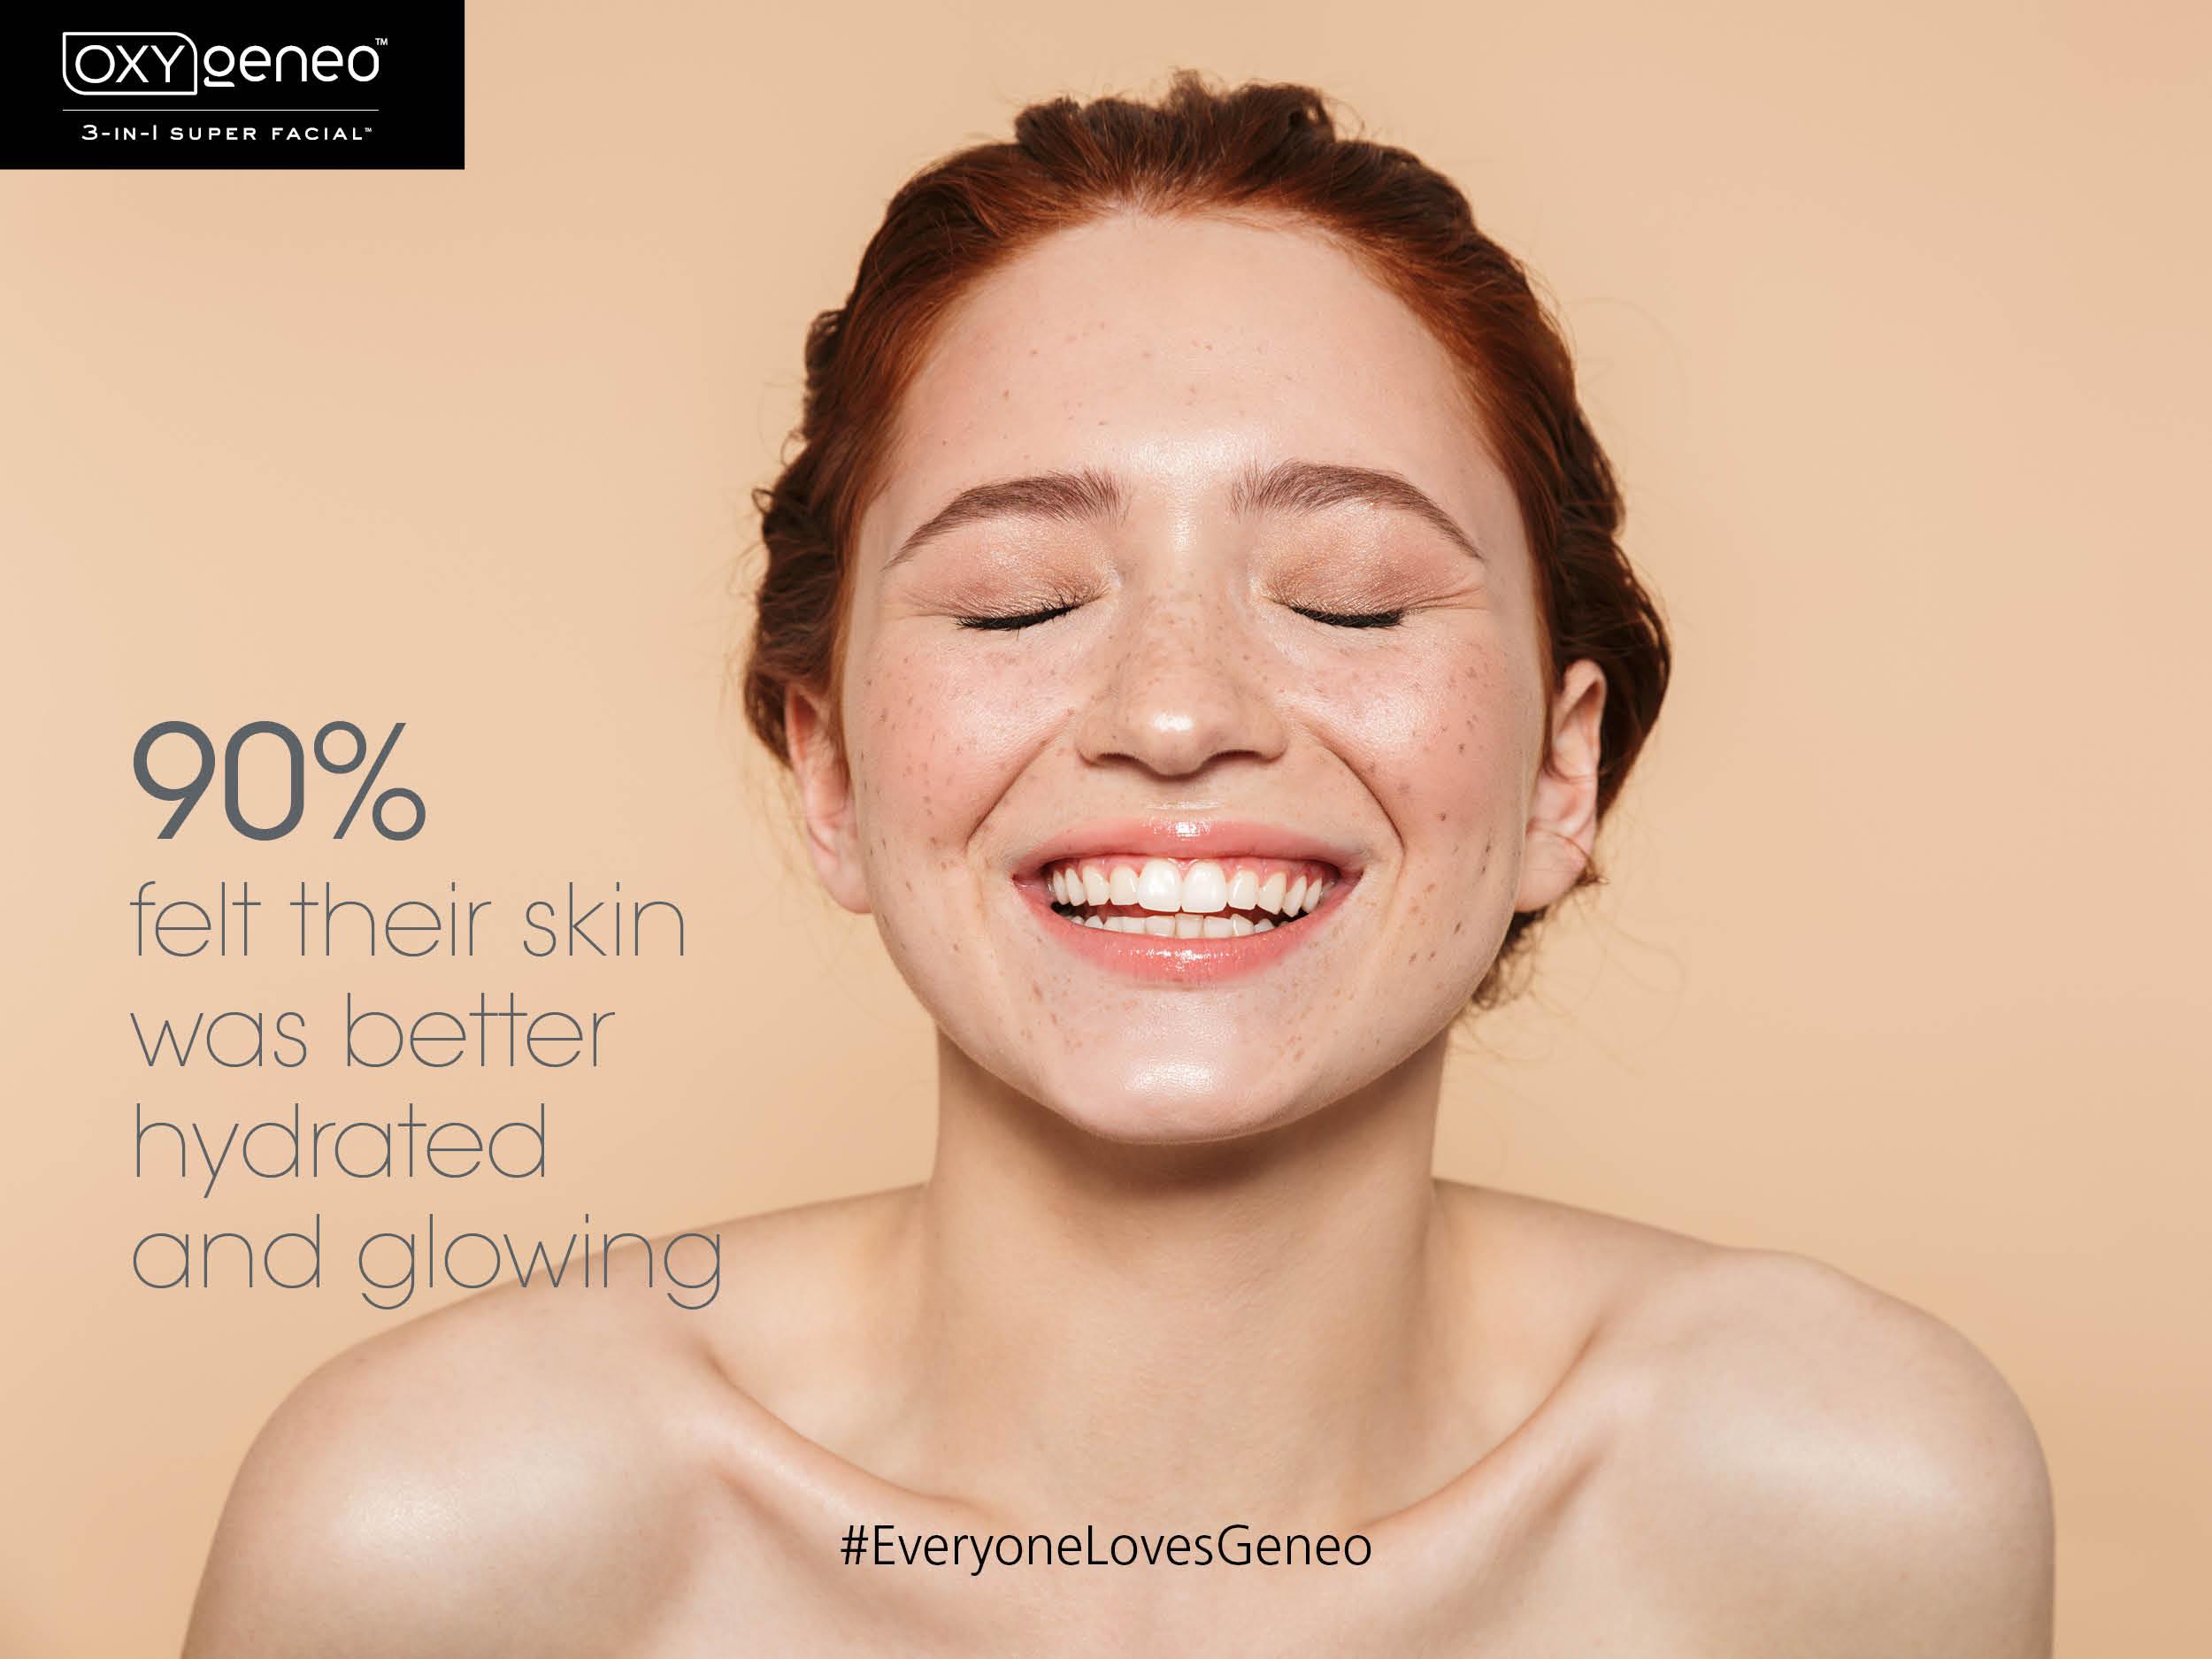 Oxy-Geneo Facials at Beauty Beyond Skin Deep